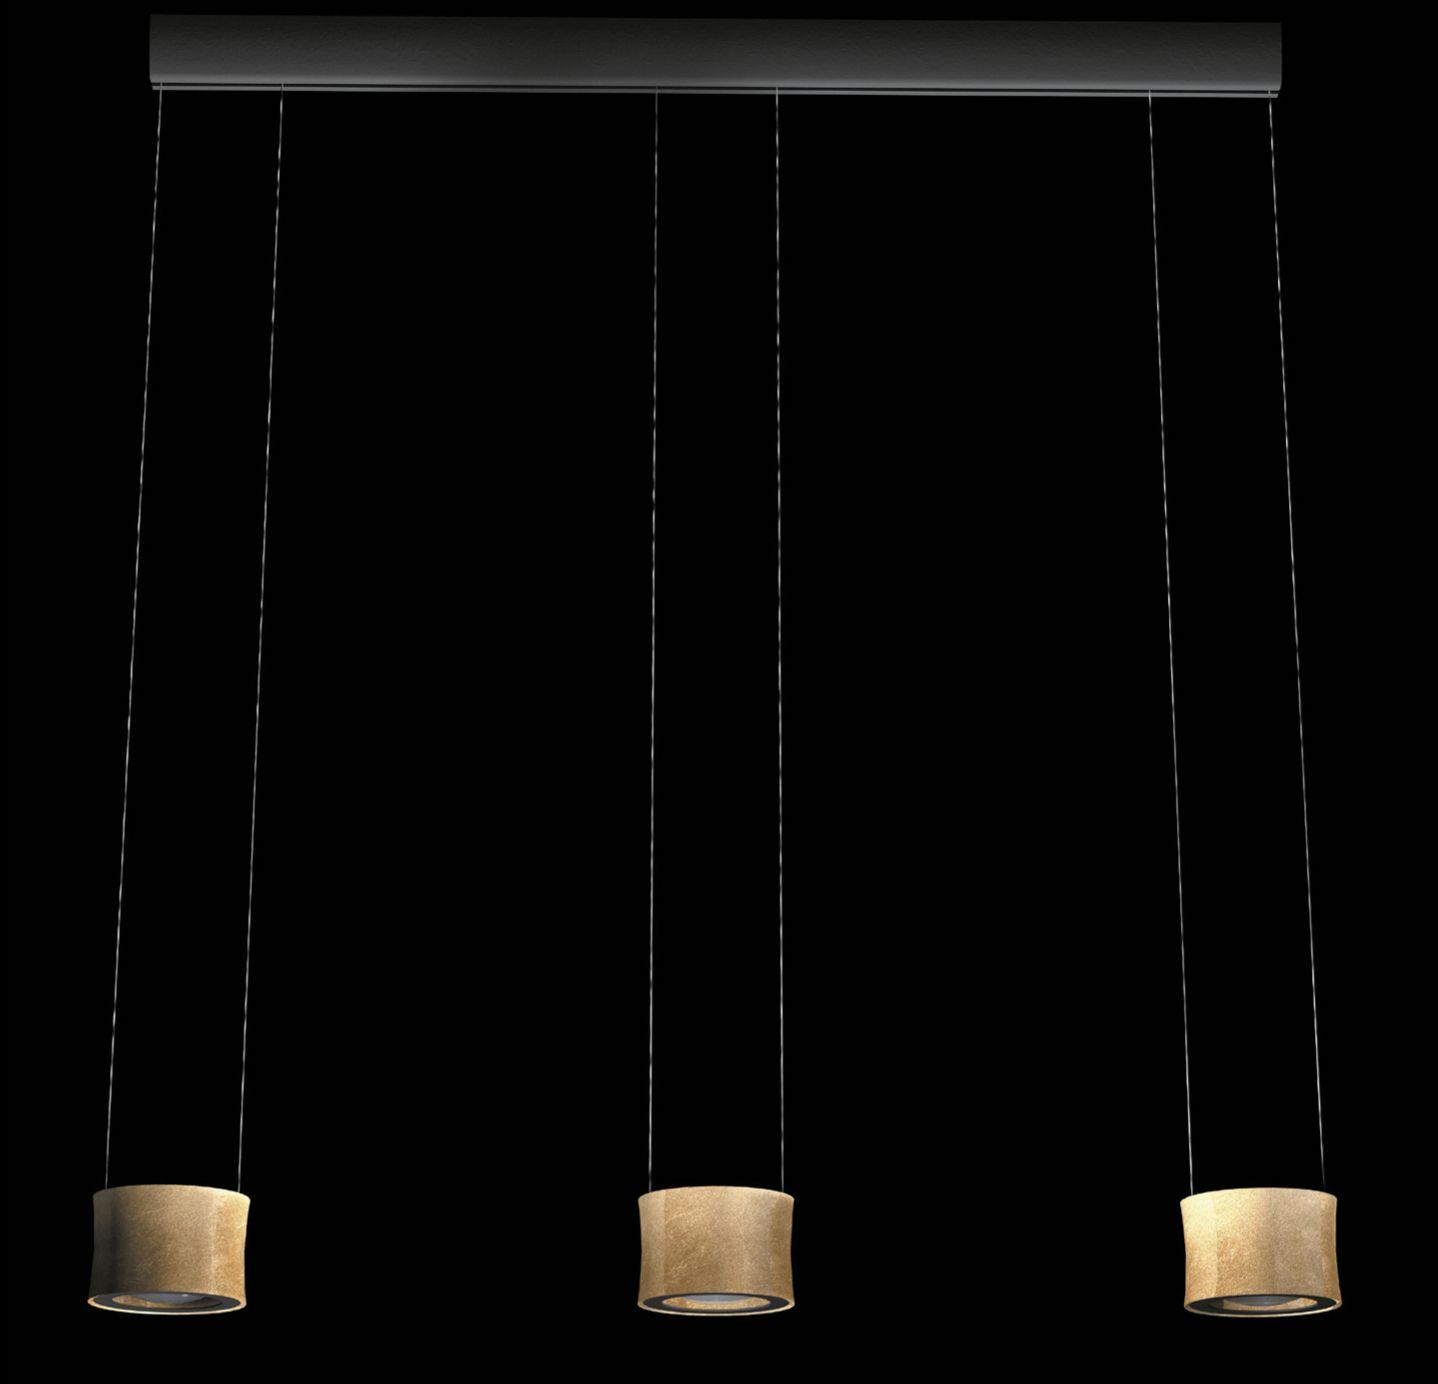 LED-Pendelleuchte Luce Elevata Impulse LED - Baldachin dunkelbraun ( auf Wunsch weiß )